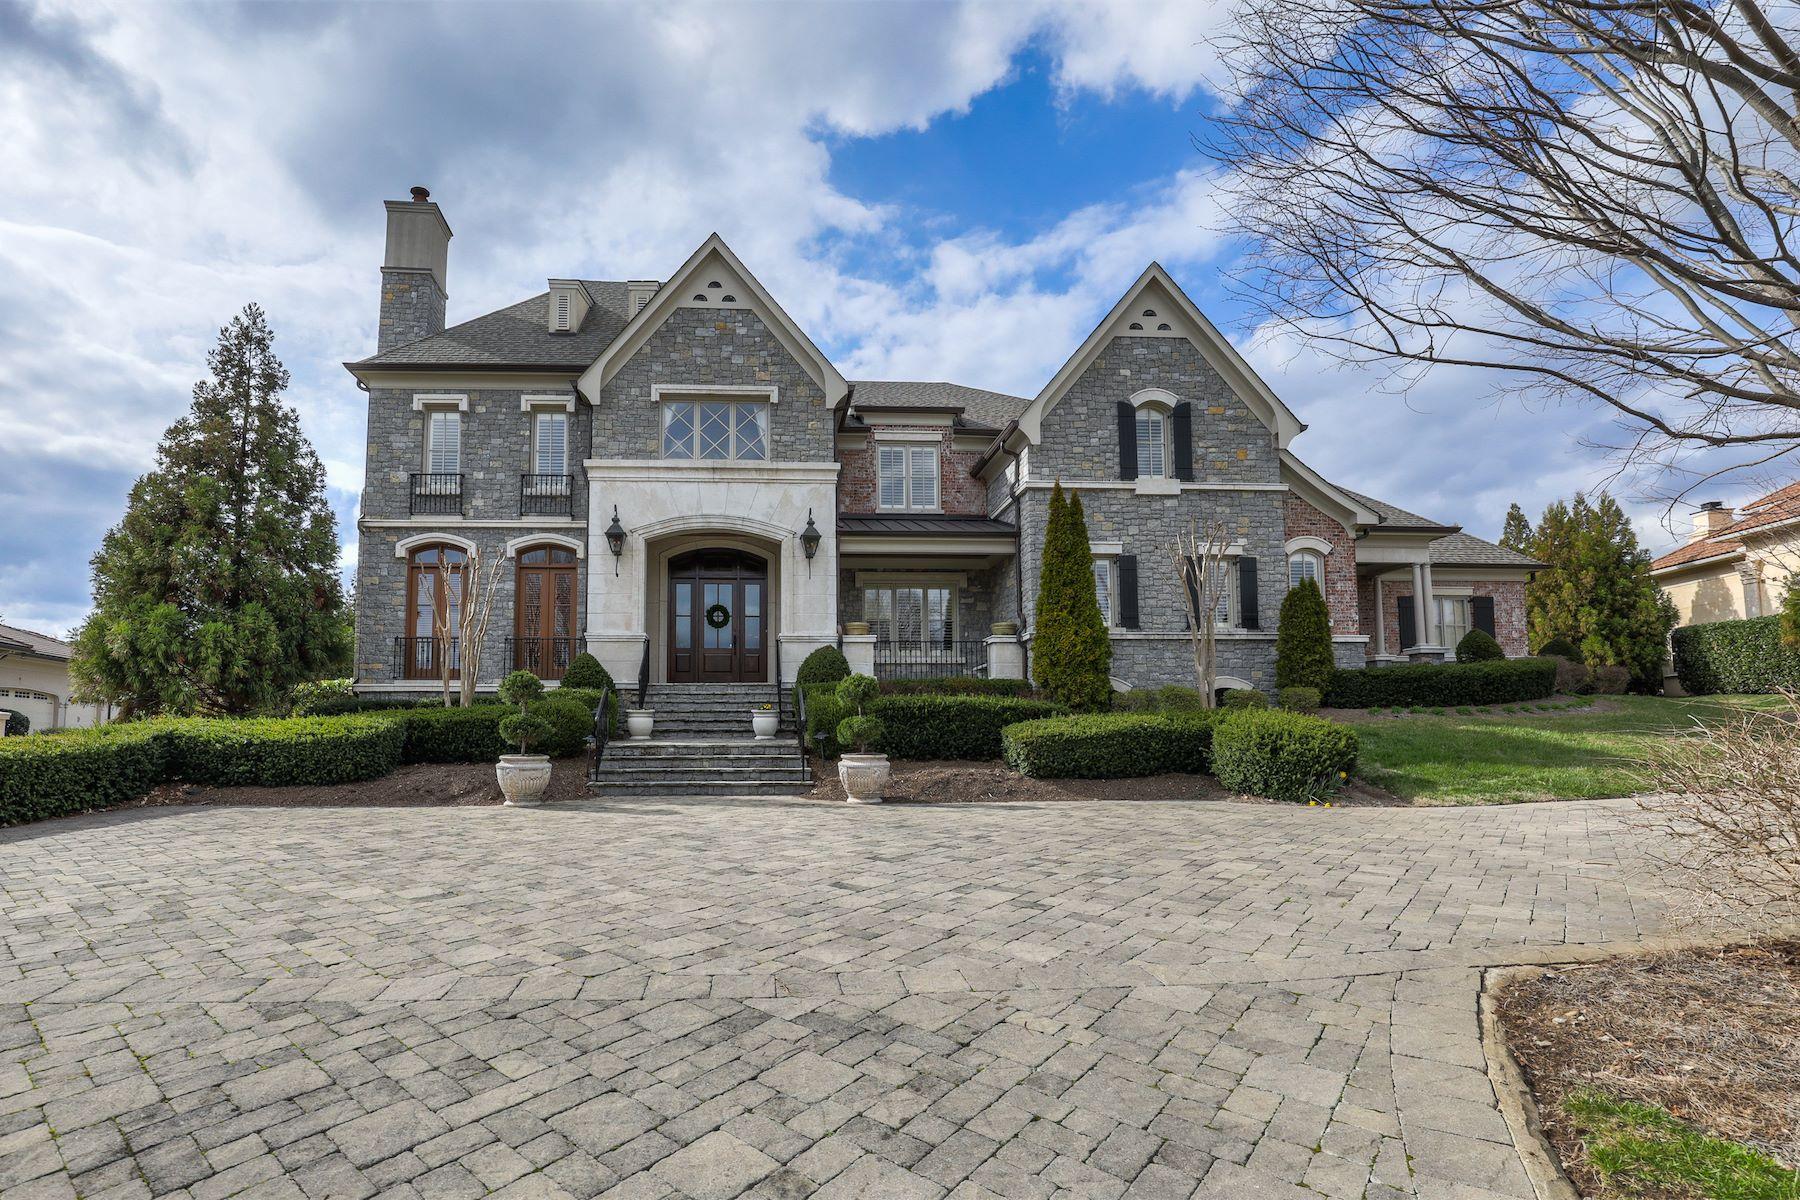 Villa per Vendita alle ore Exclusive Annandale Residence 367 Jones Parkway Brentwood, Tennessee, 37027 Stati Uniti